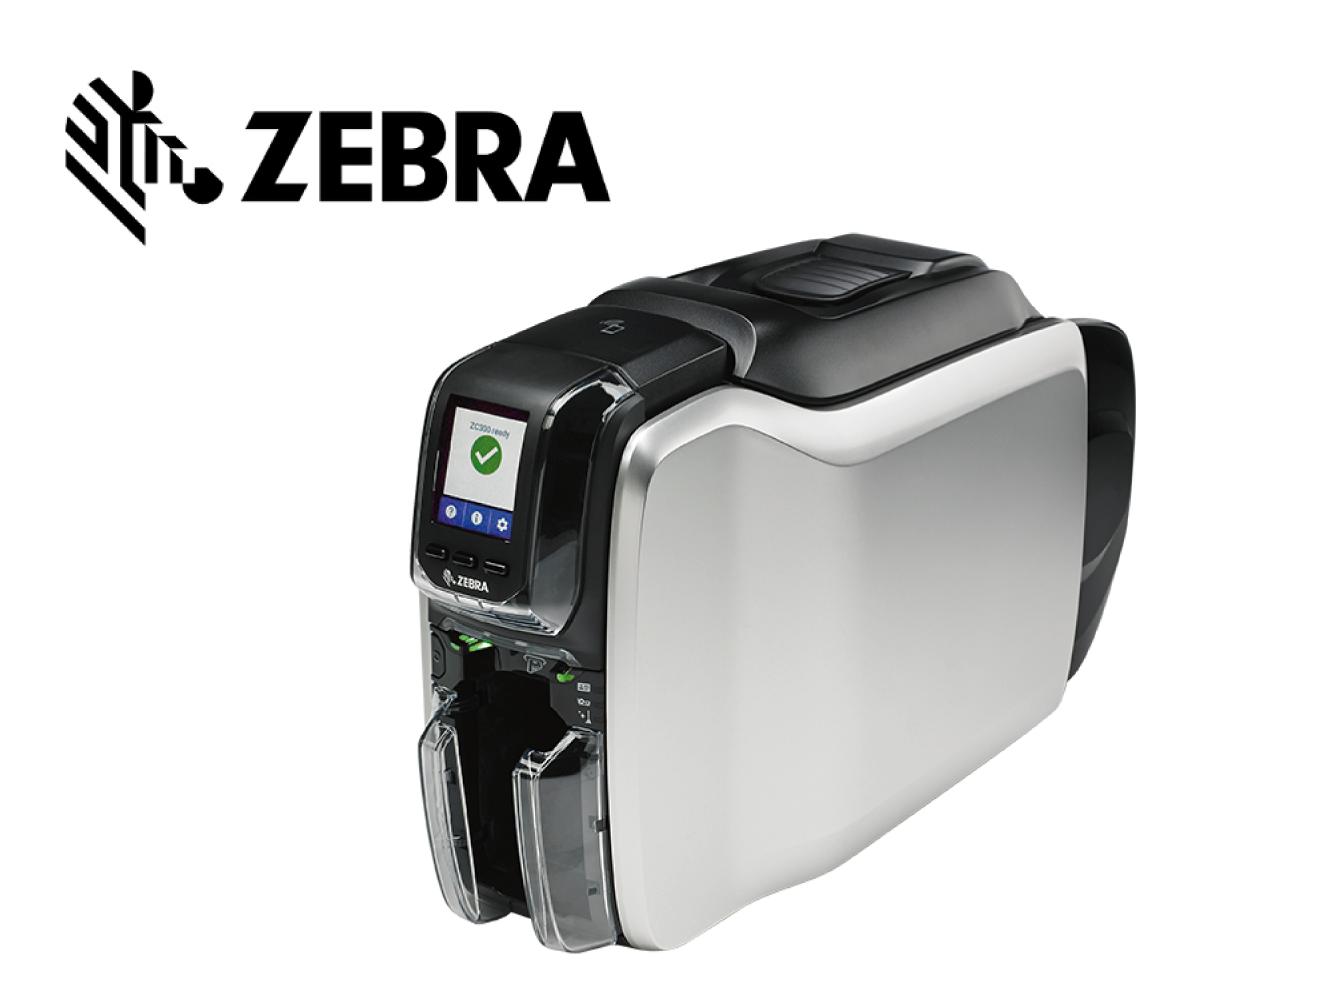 IMPRIMANTE A CARTES - ZEBRA ZC300